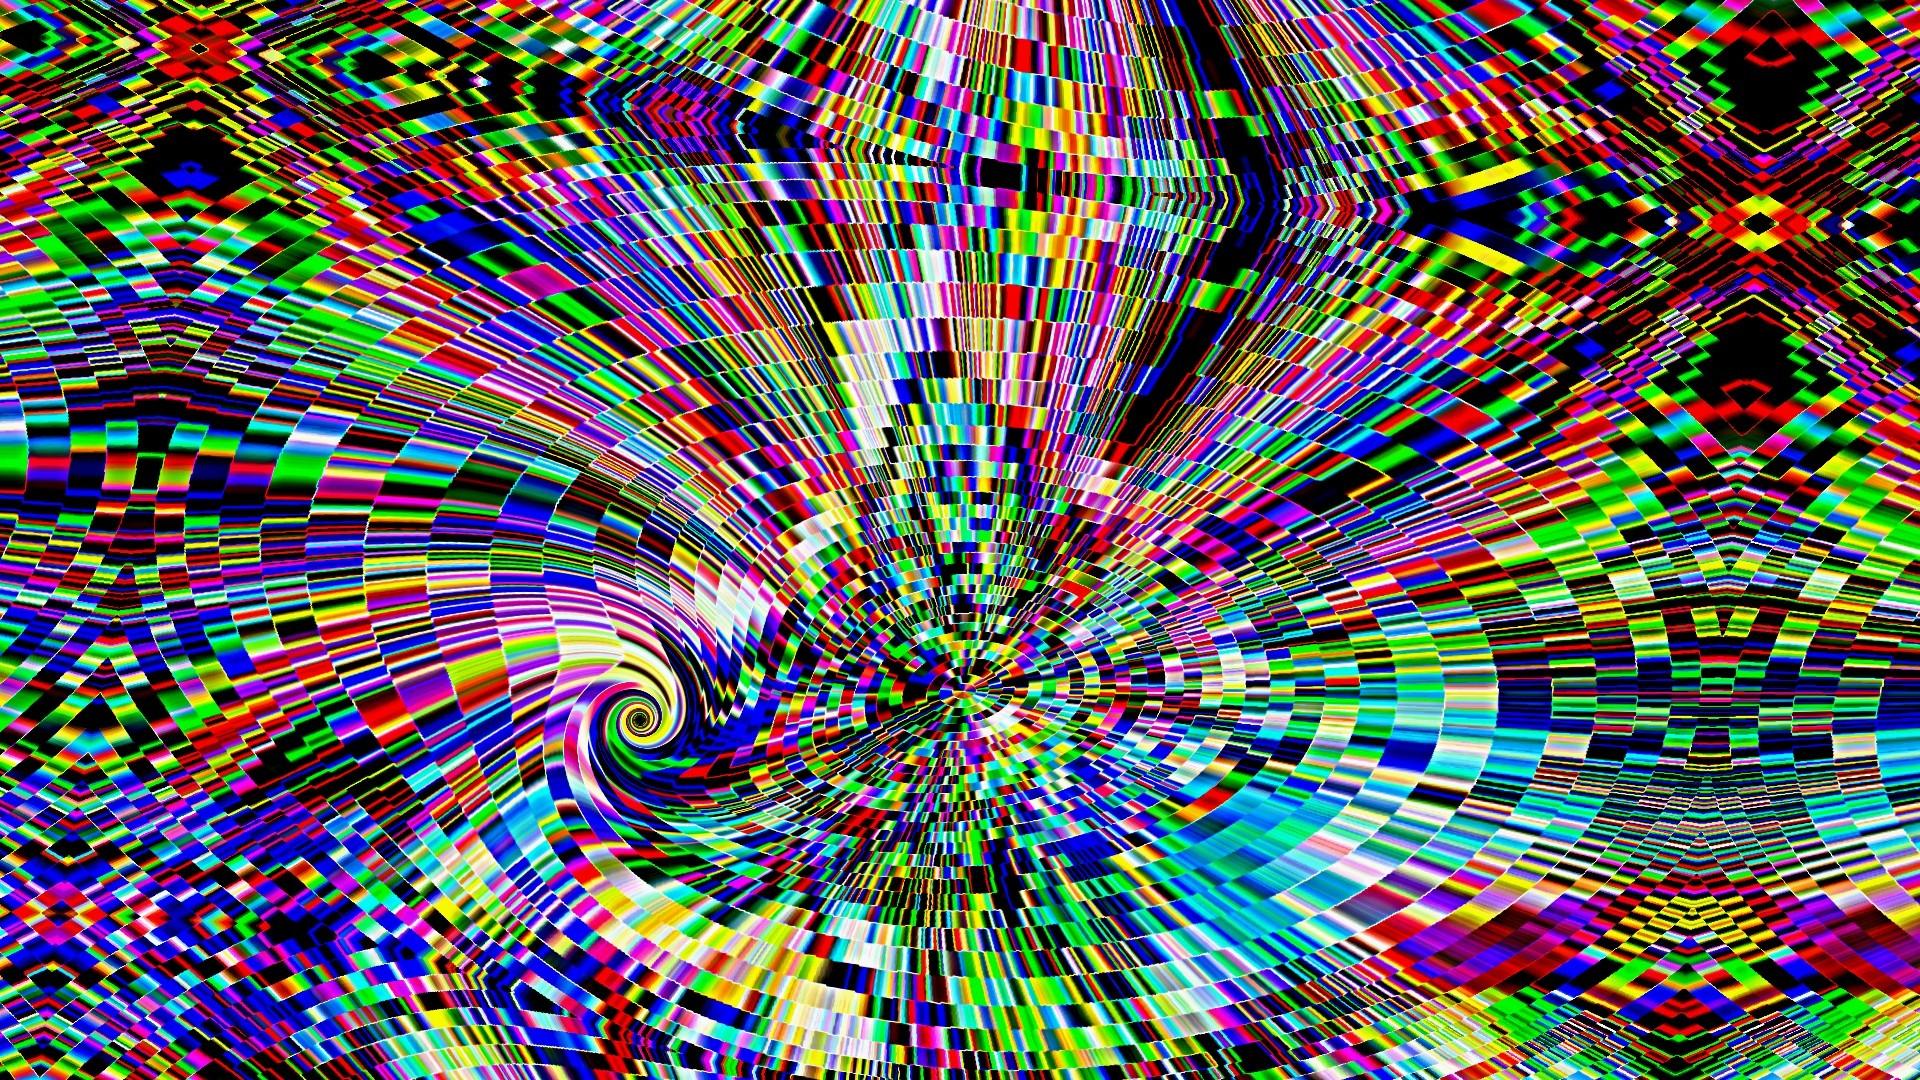 LSD pixelarater guntoyudor by correo1231 LSD pixelarater guntoyudor by  correo1231